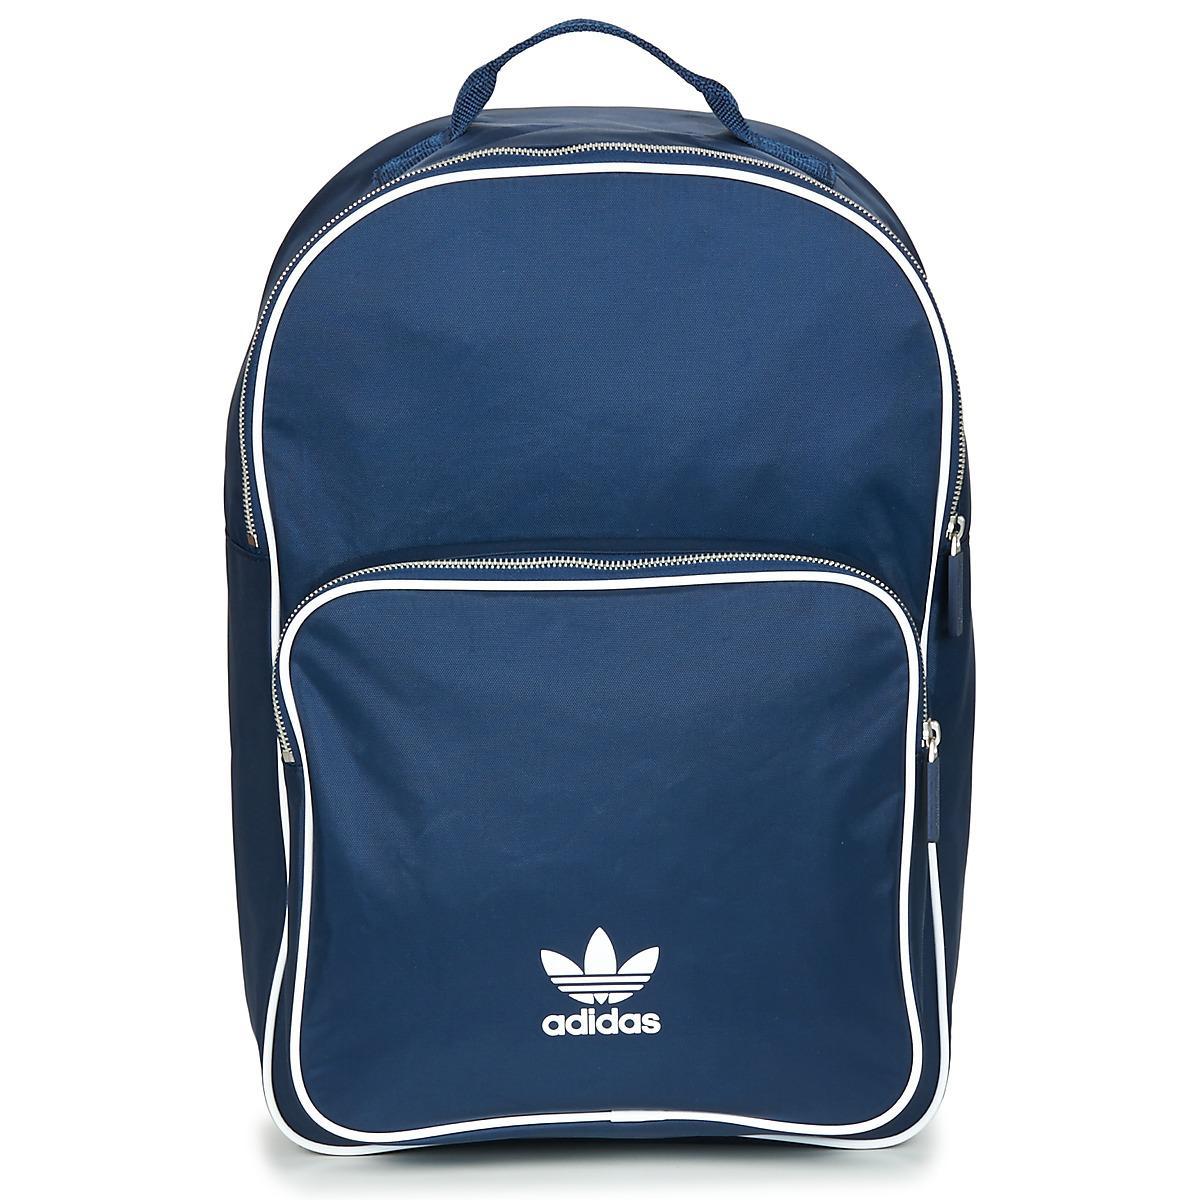 greece adidas dh2963 bolsa de deporte niñas multco eb4d0 c3024  usa adidas  bp cl adicolor mens backpack in blue in blue for men lyst a03a6 591a4 b86383c296bca